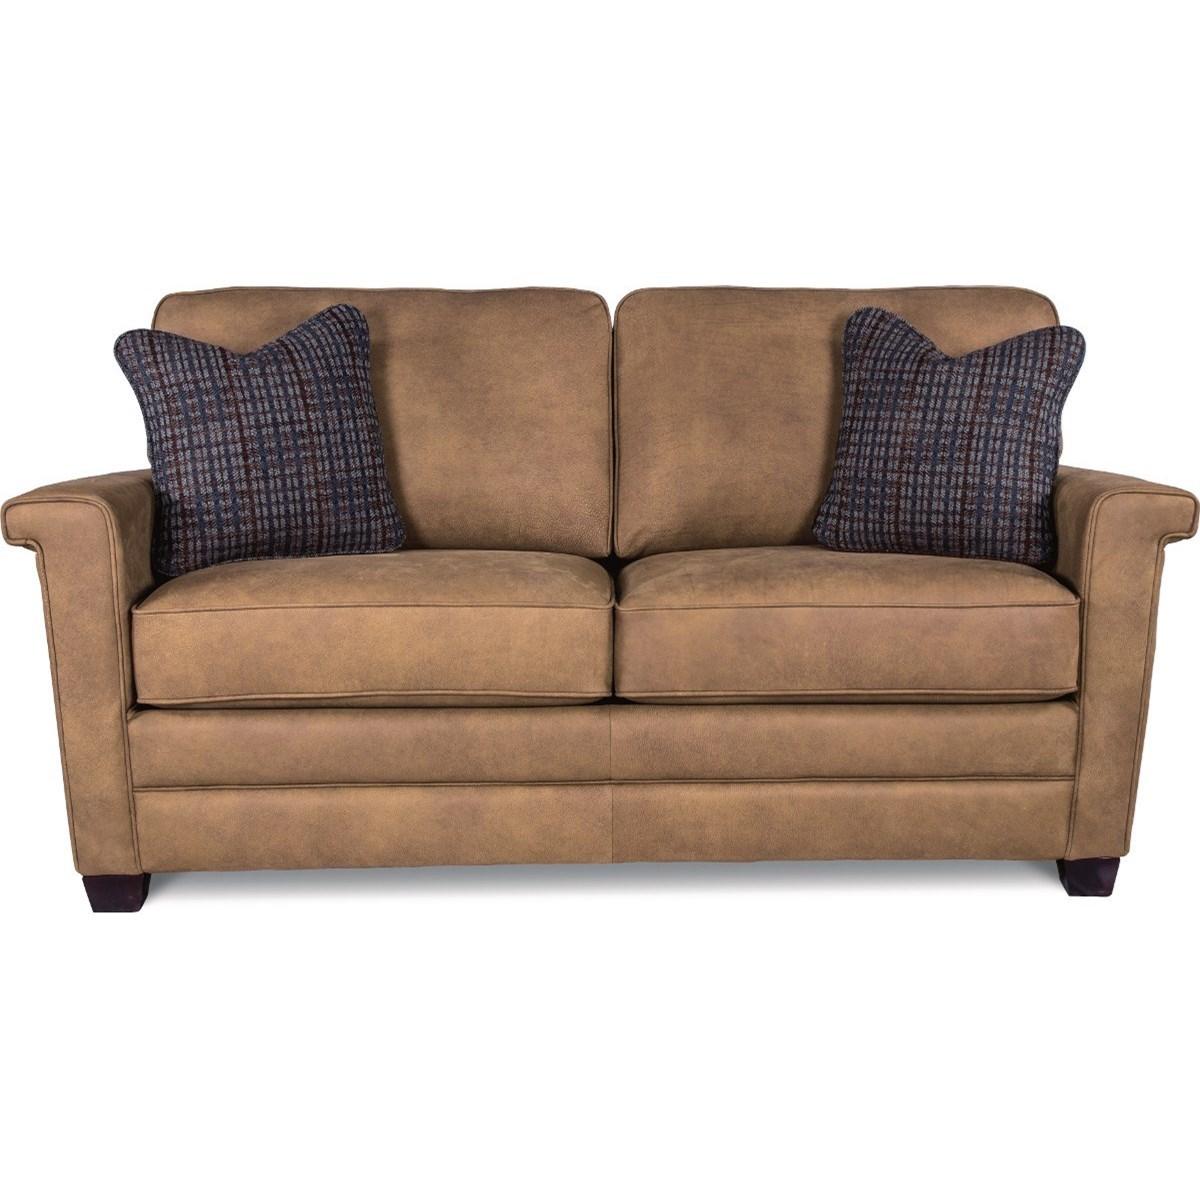 - La-Z-Boy Bexley Contemporary Full Size Sleeper Sofa Bennett's